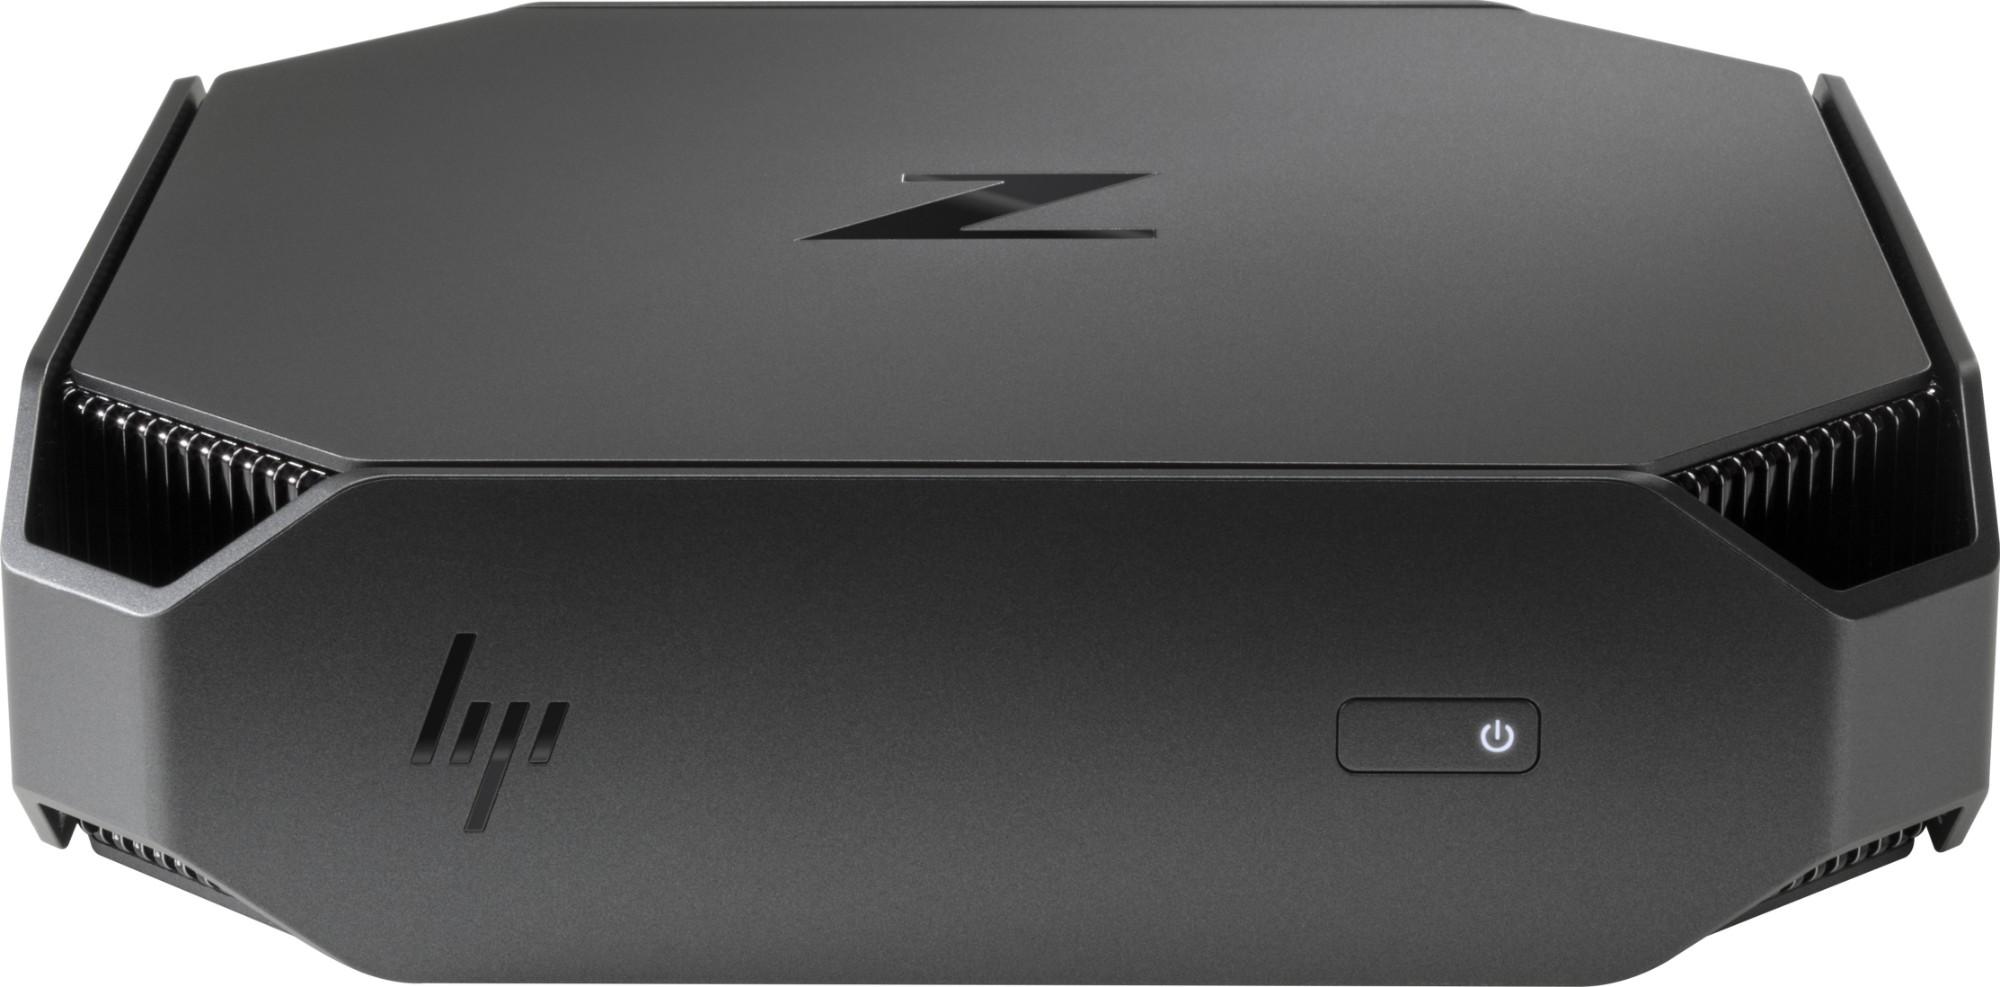 HP Z Z2 Mini G3 Workstation (ENERGY STAR)